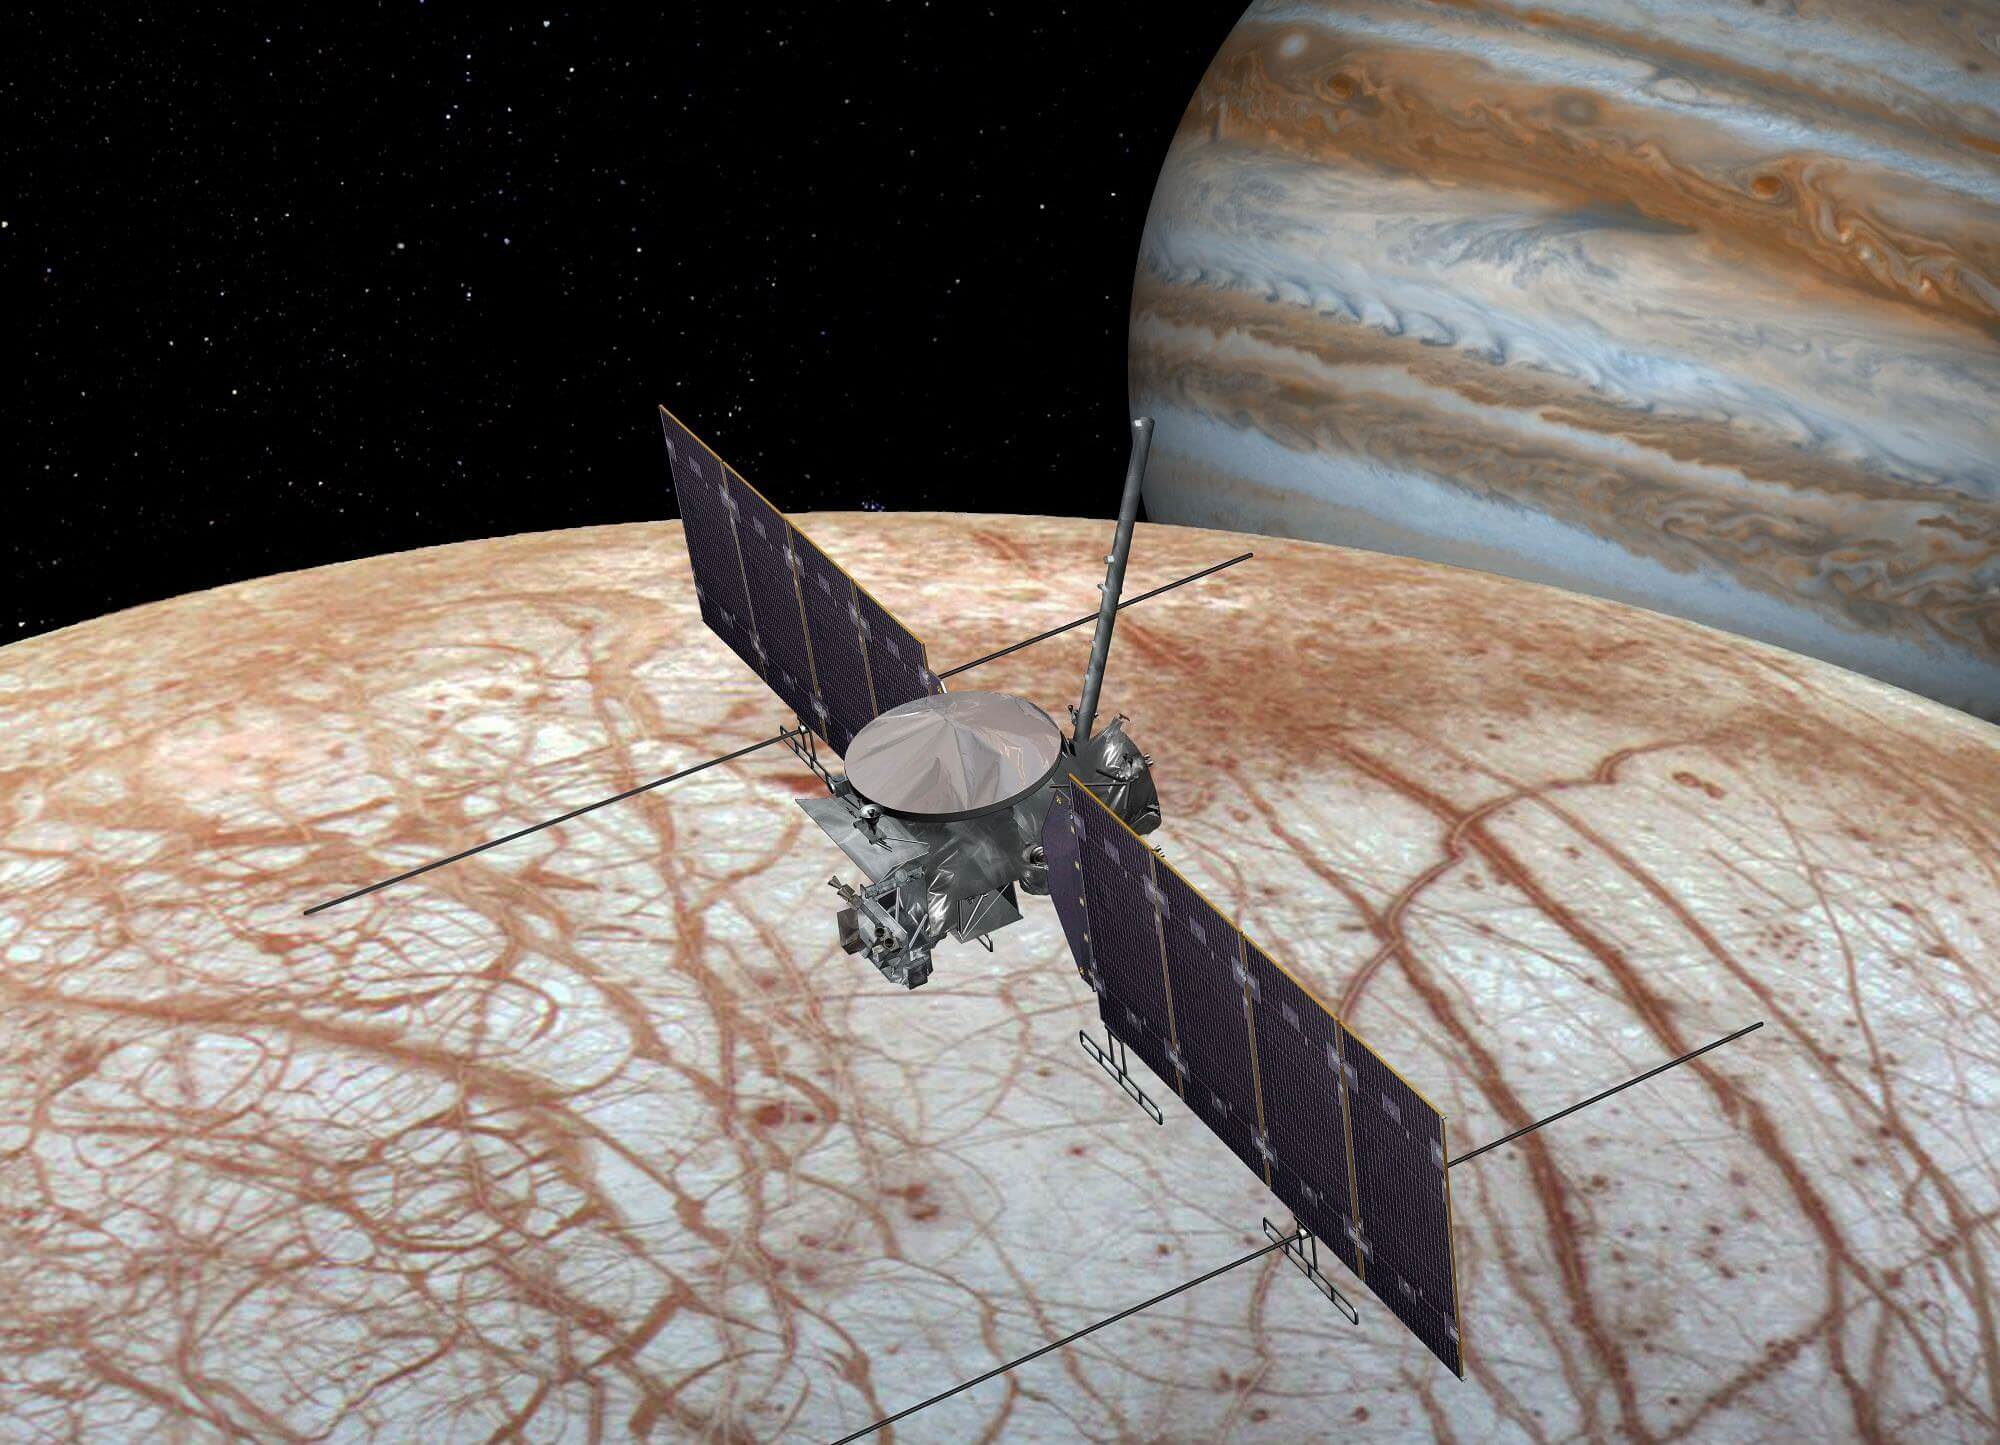 Artist's concept of a Europa Clipper mission. - Image Credit: NASA/JPL